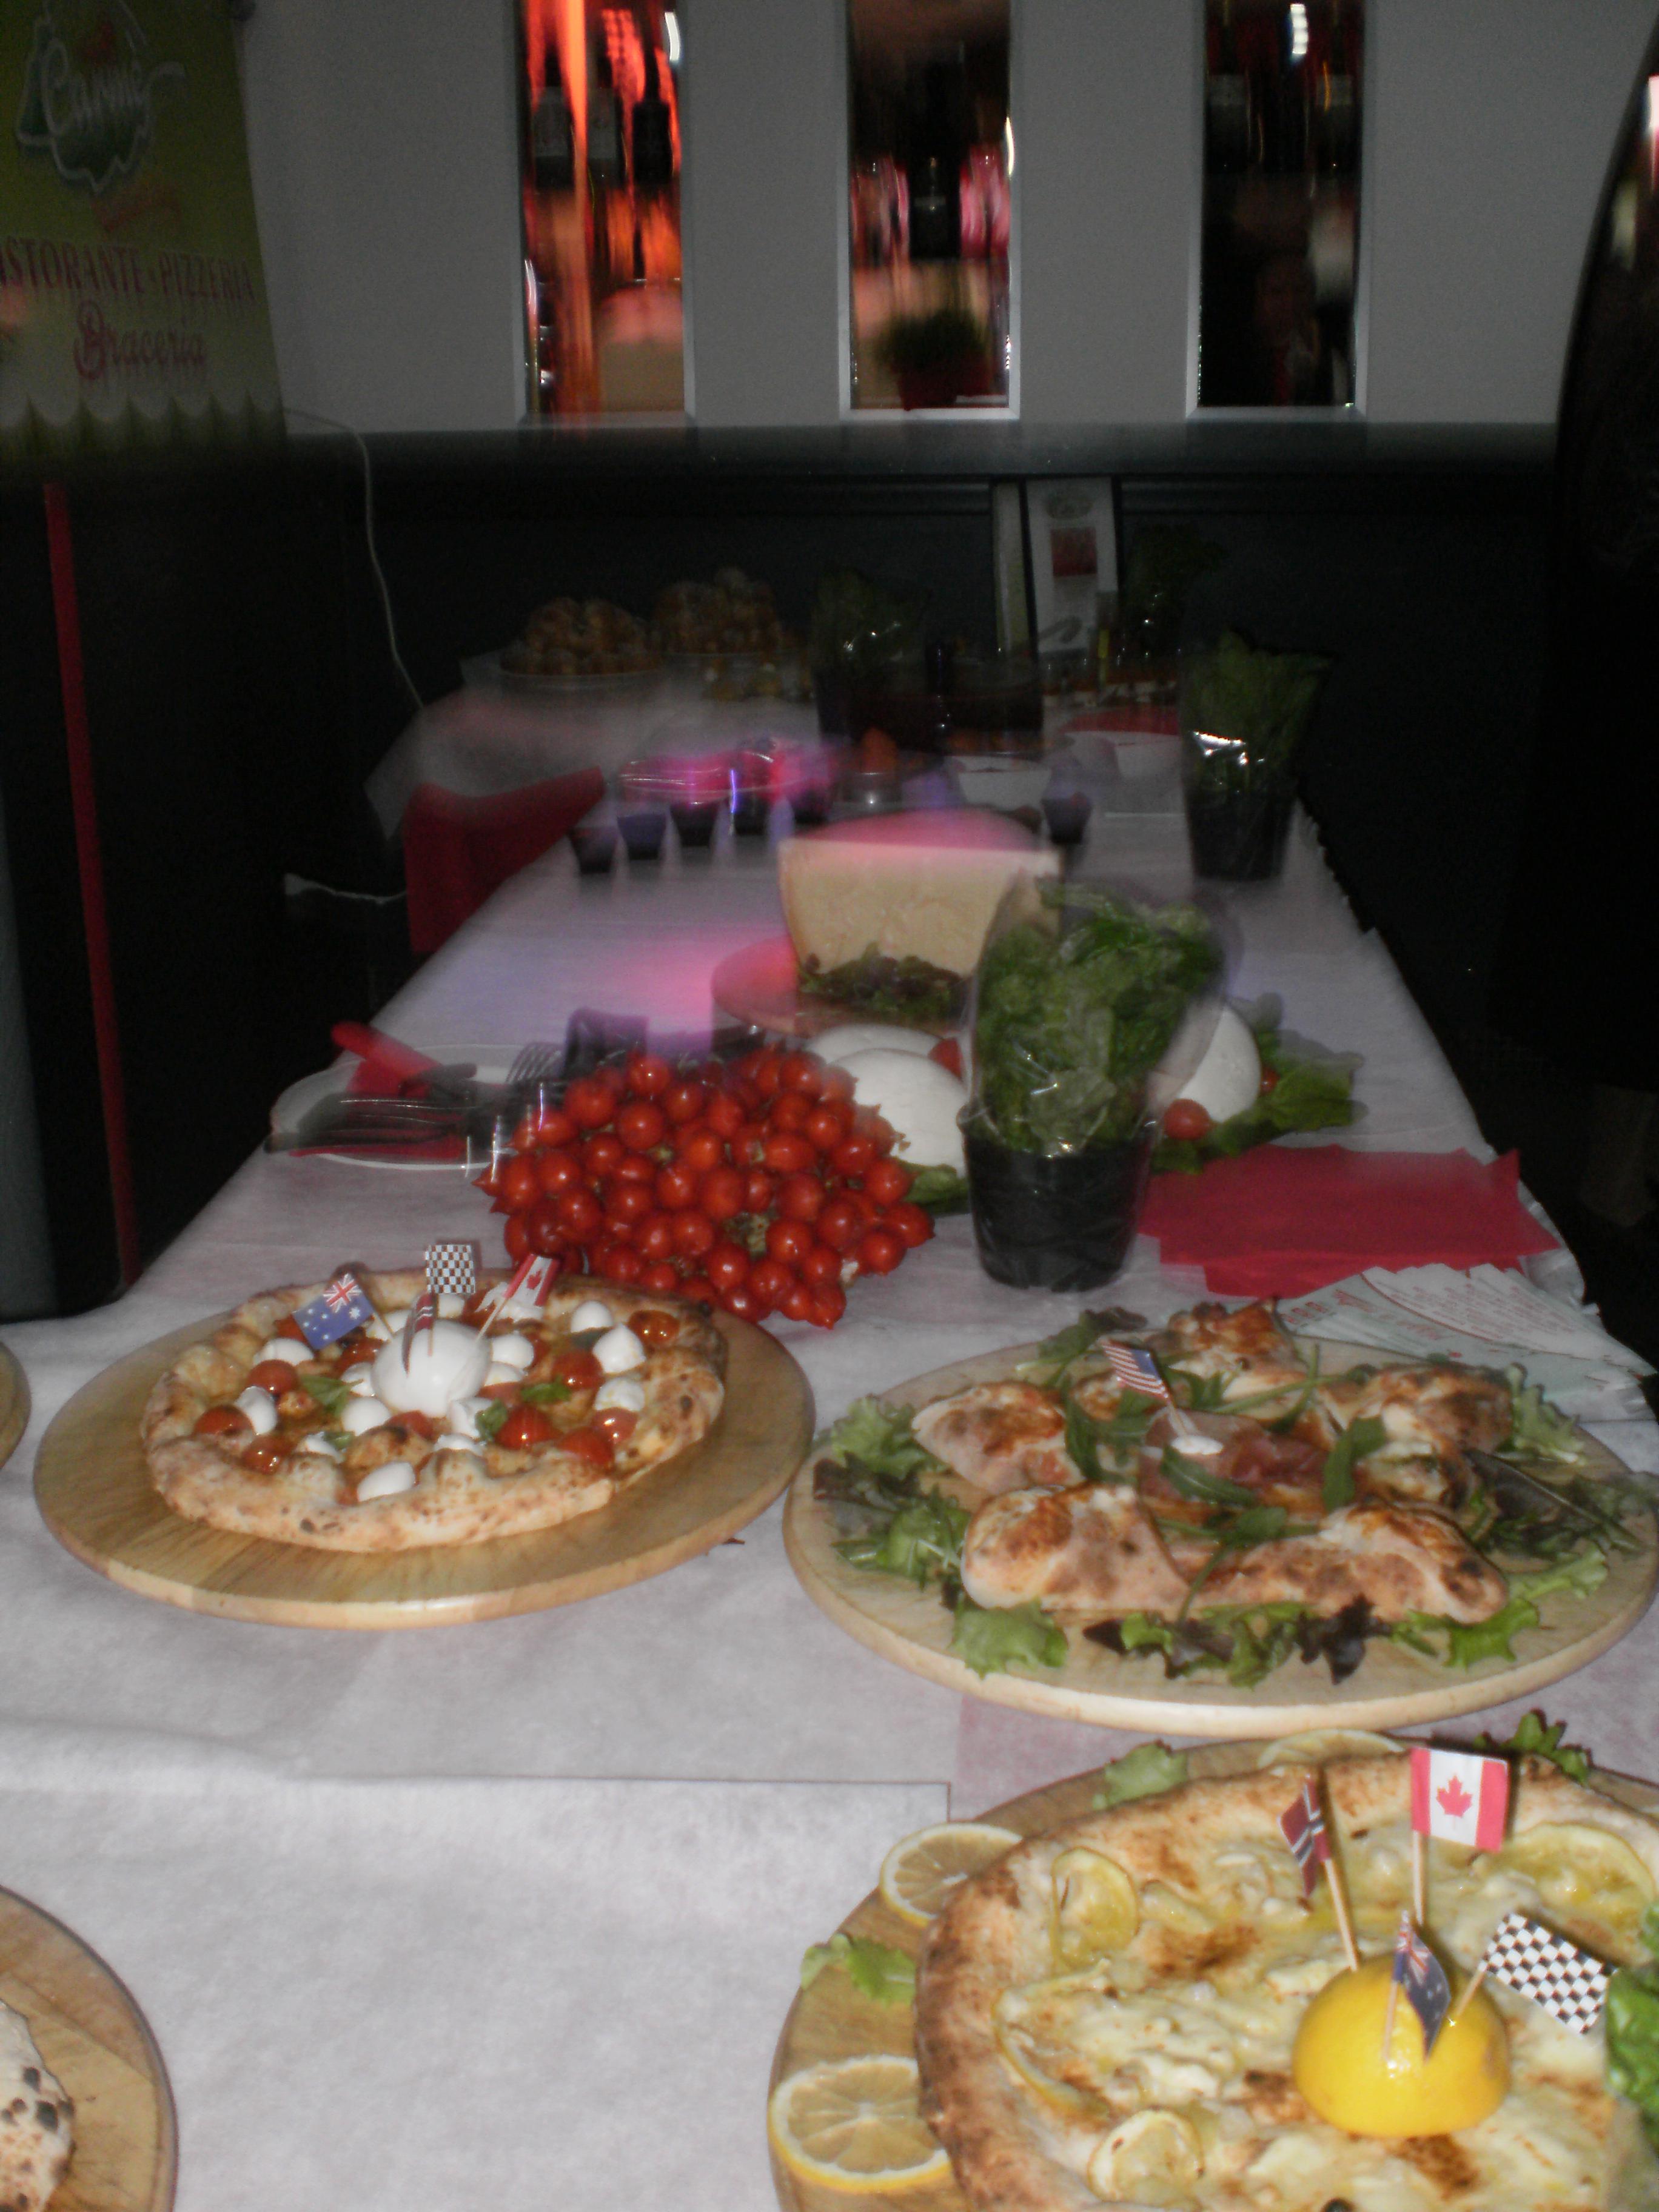 tavola imbandita con pomodori del Piennolo